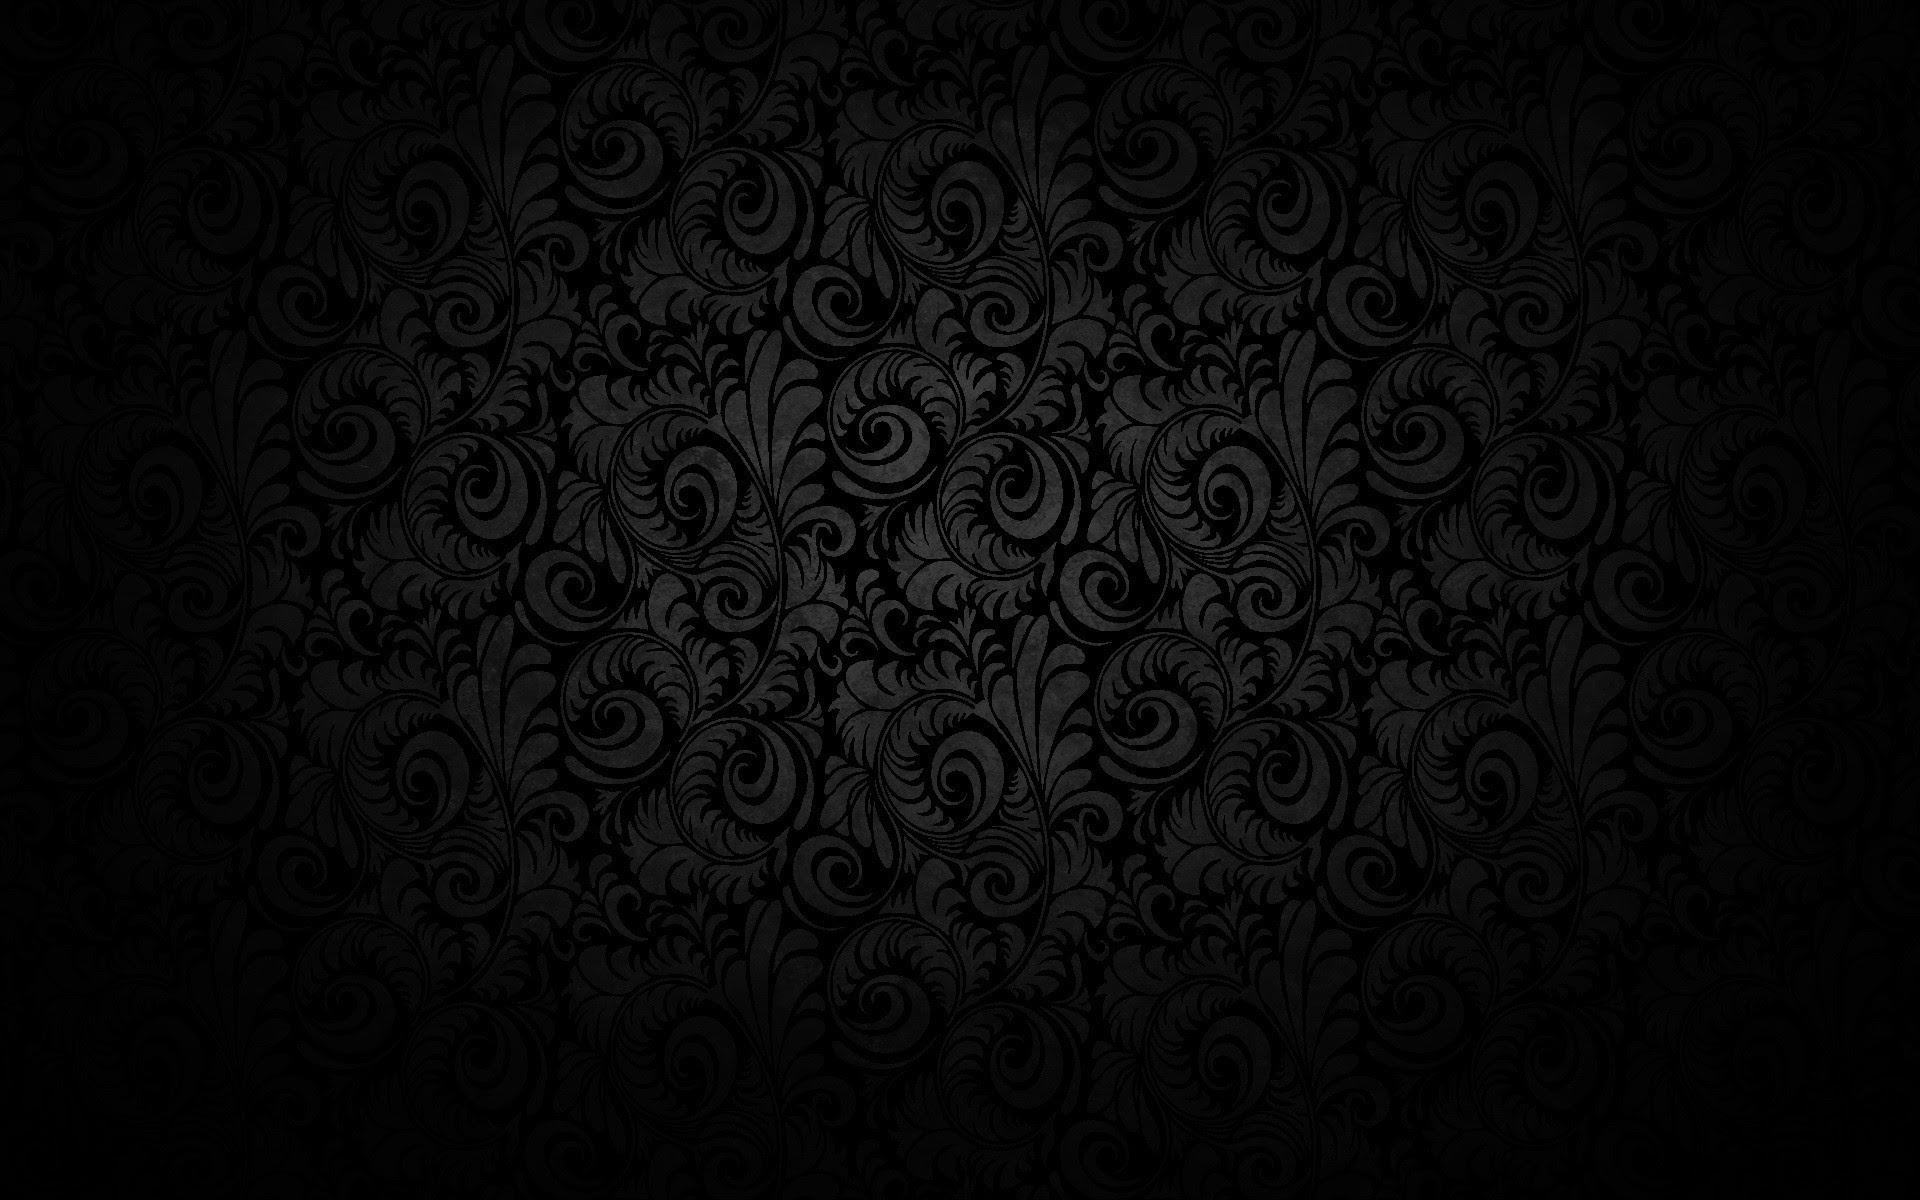 Download 900 Wallpaper Hd Black HD